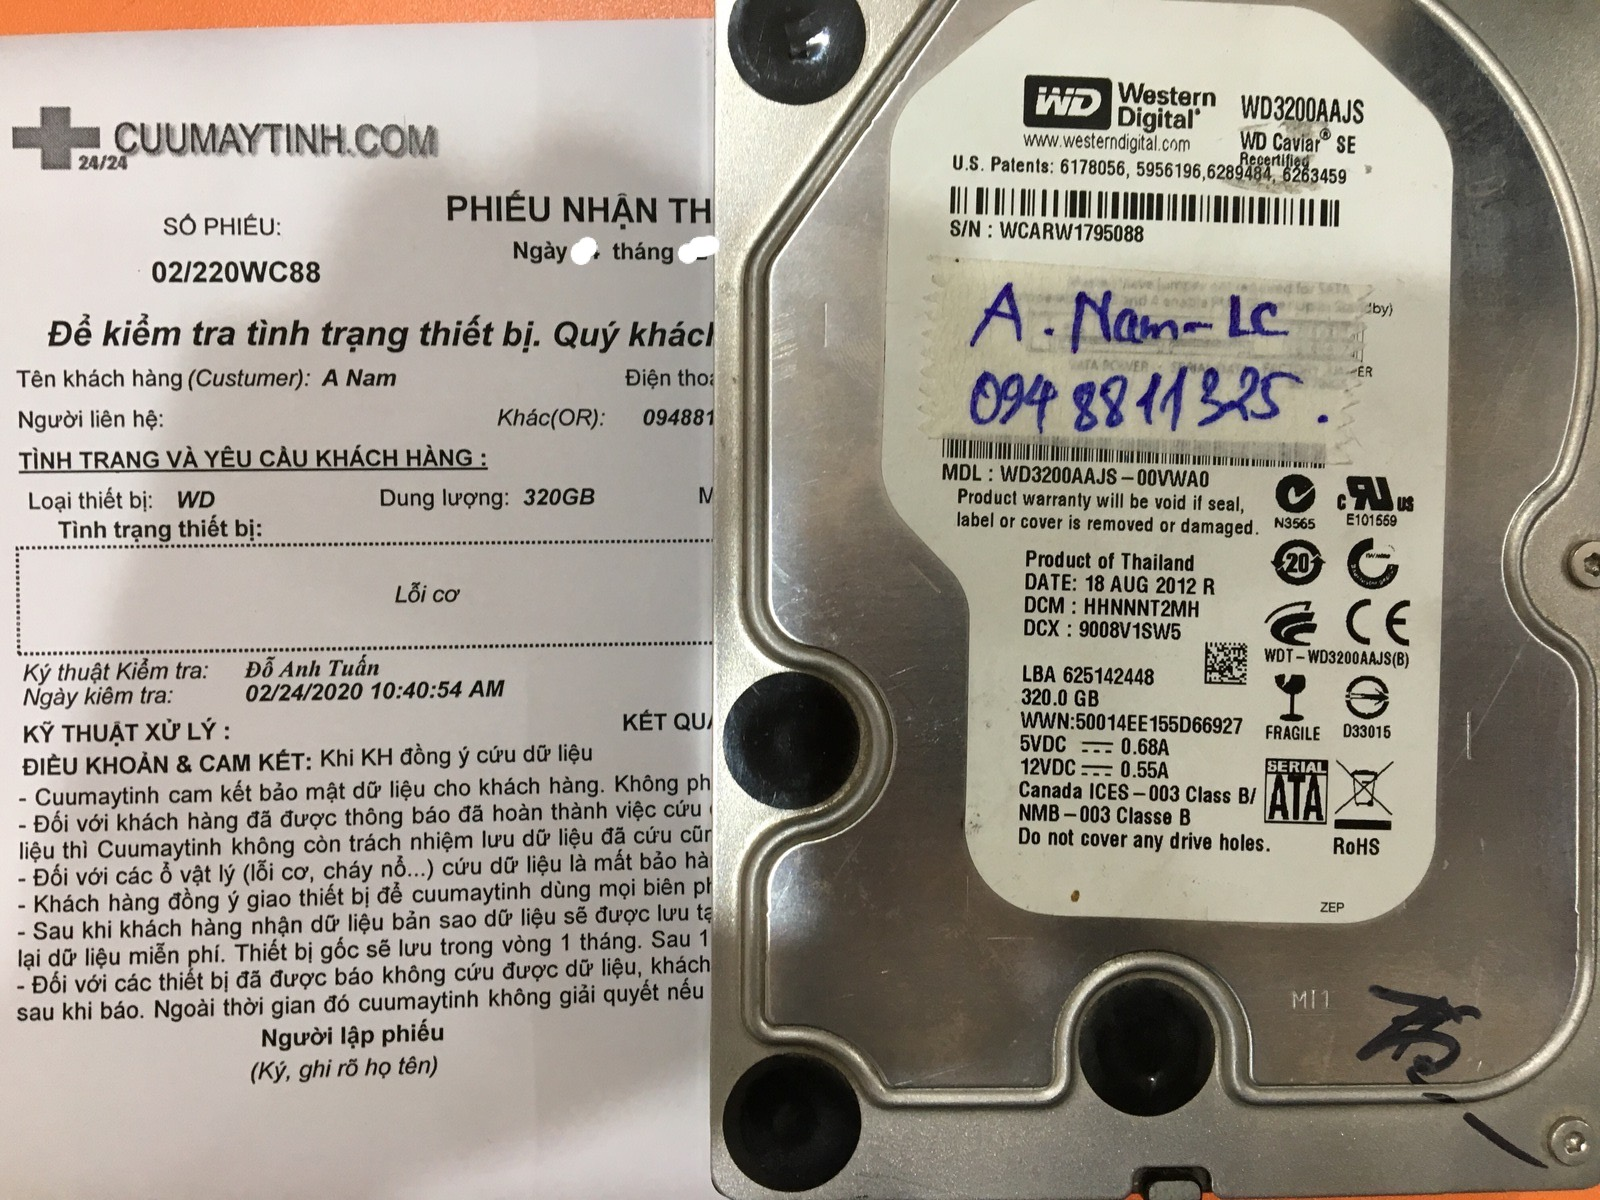 Cứu dữ liệu ổ cứng Western 320GB lỗi cơ 12/03/2020 - cuumaytinh